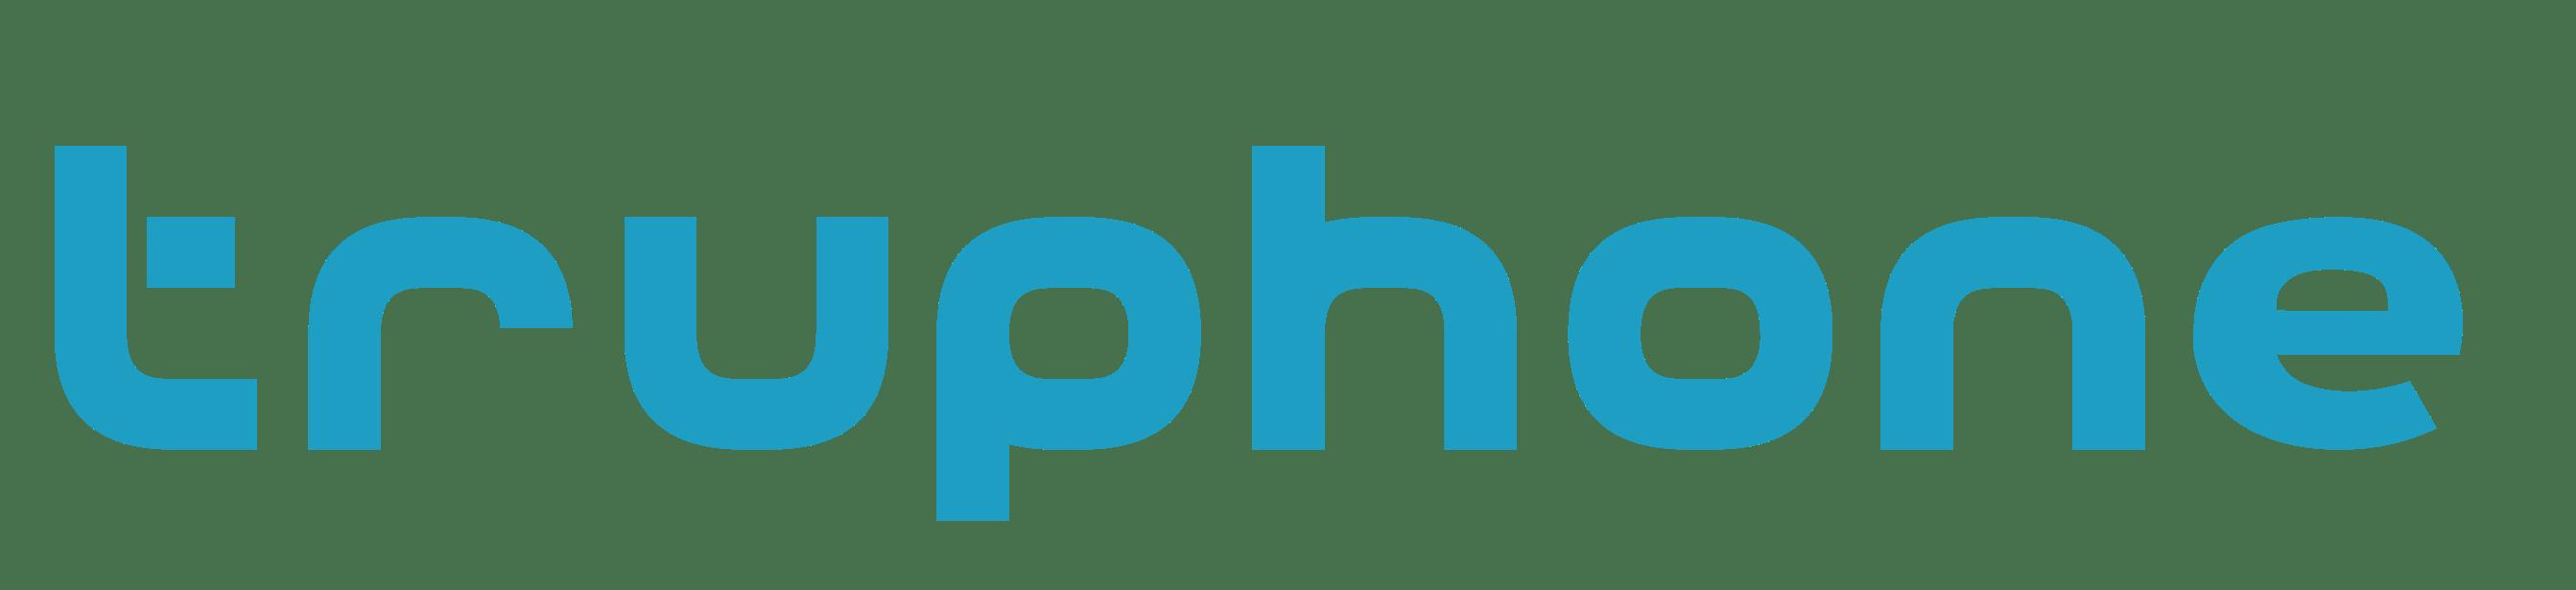 Truphone company logo